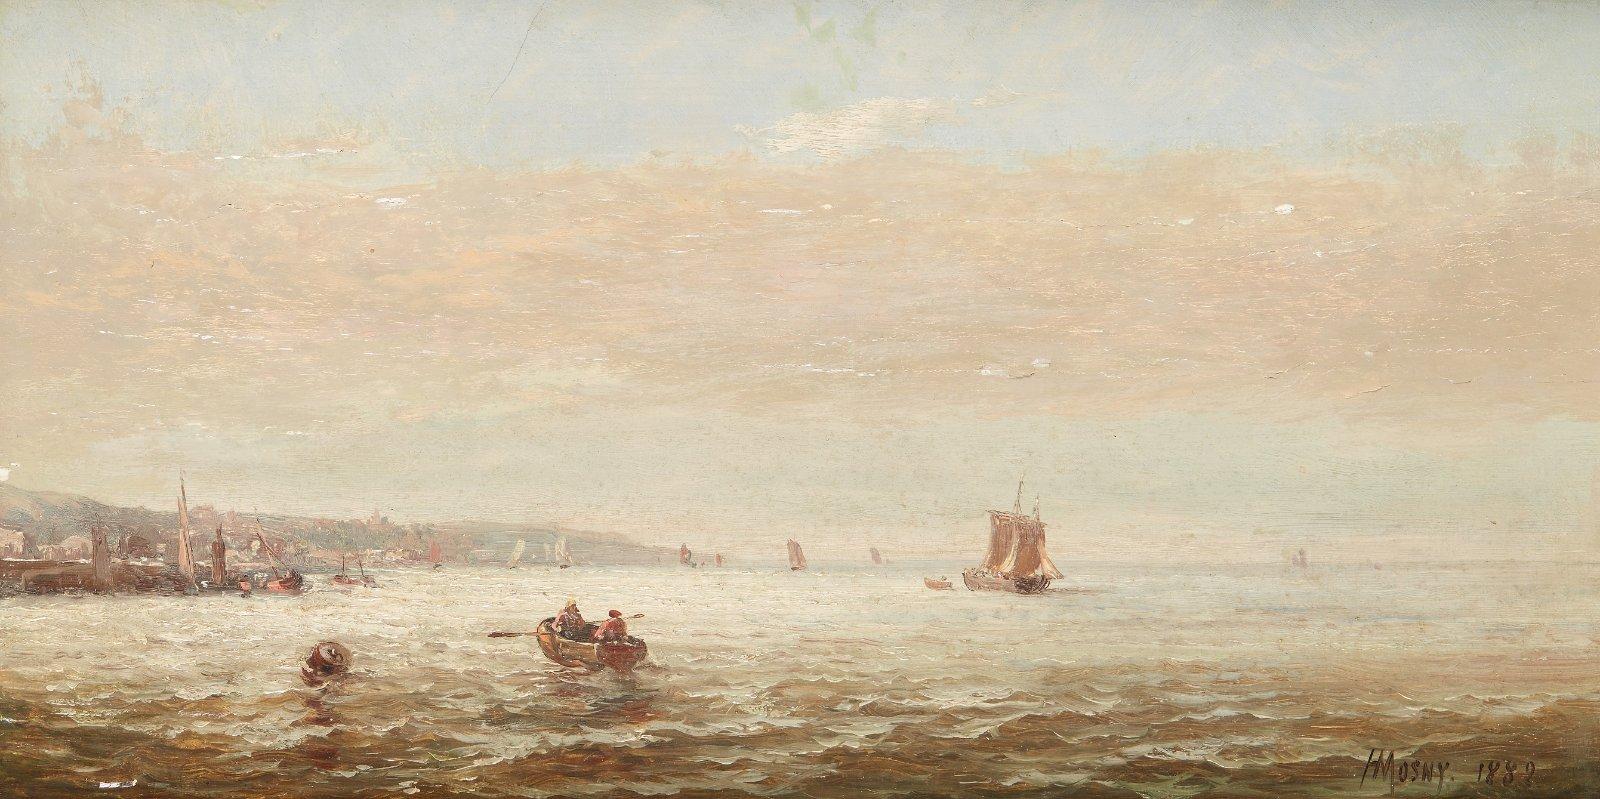 Untitled work. 1888. Oil on panel.